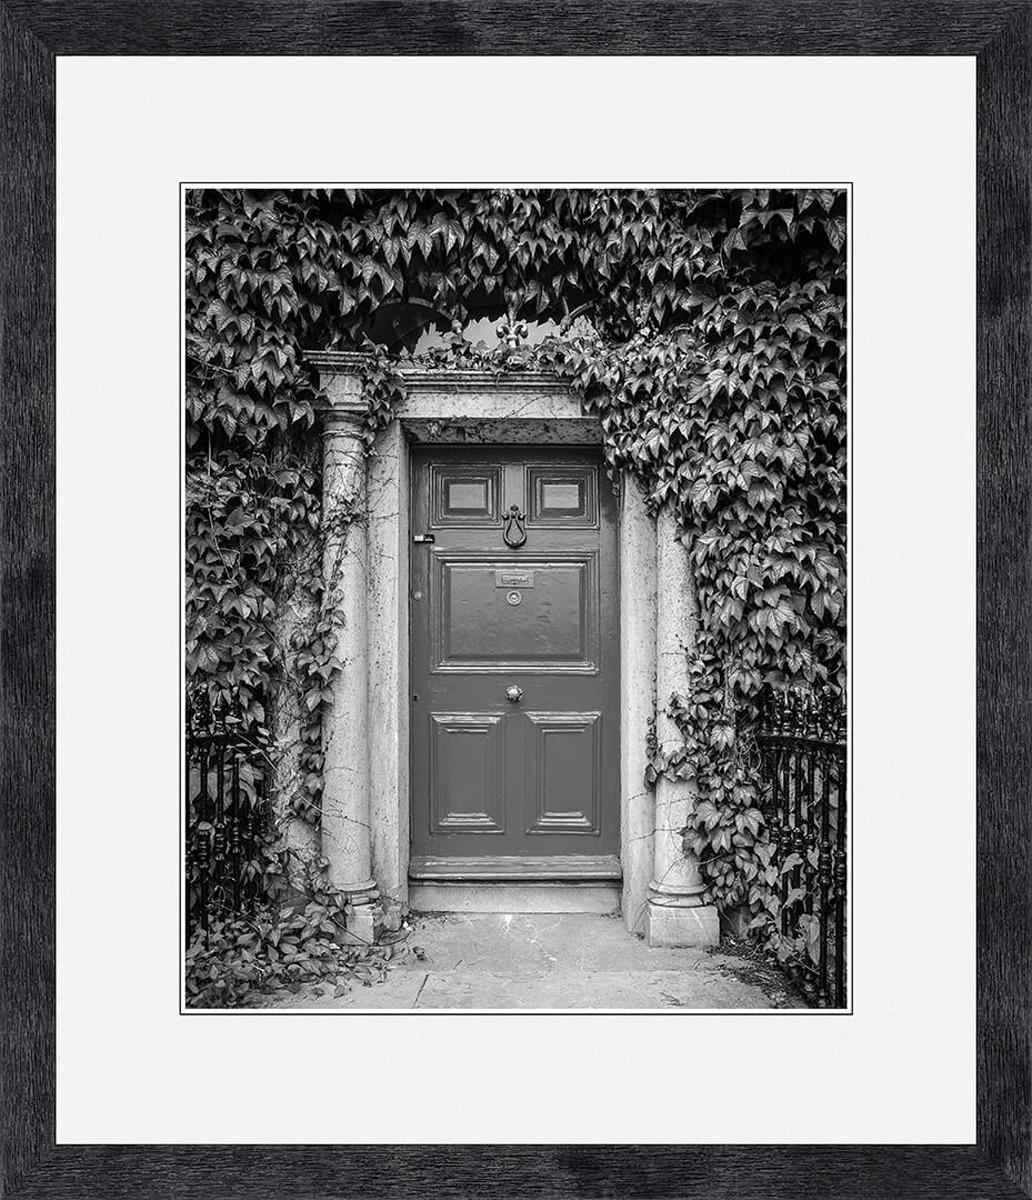 Картина Postermarket Старинная дверь, 33 х 40 см цена